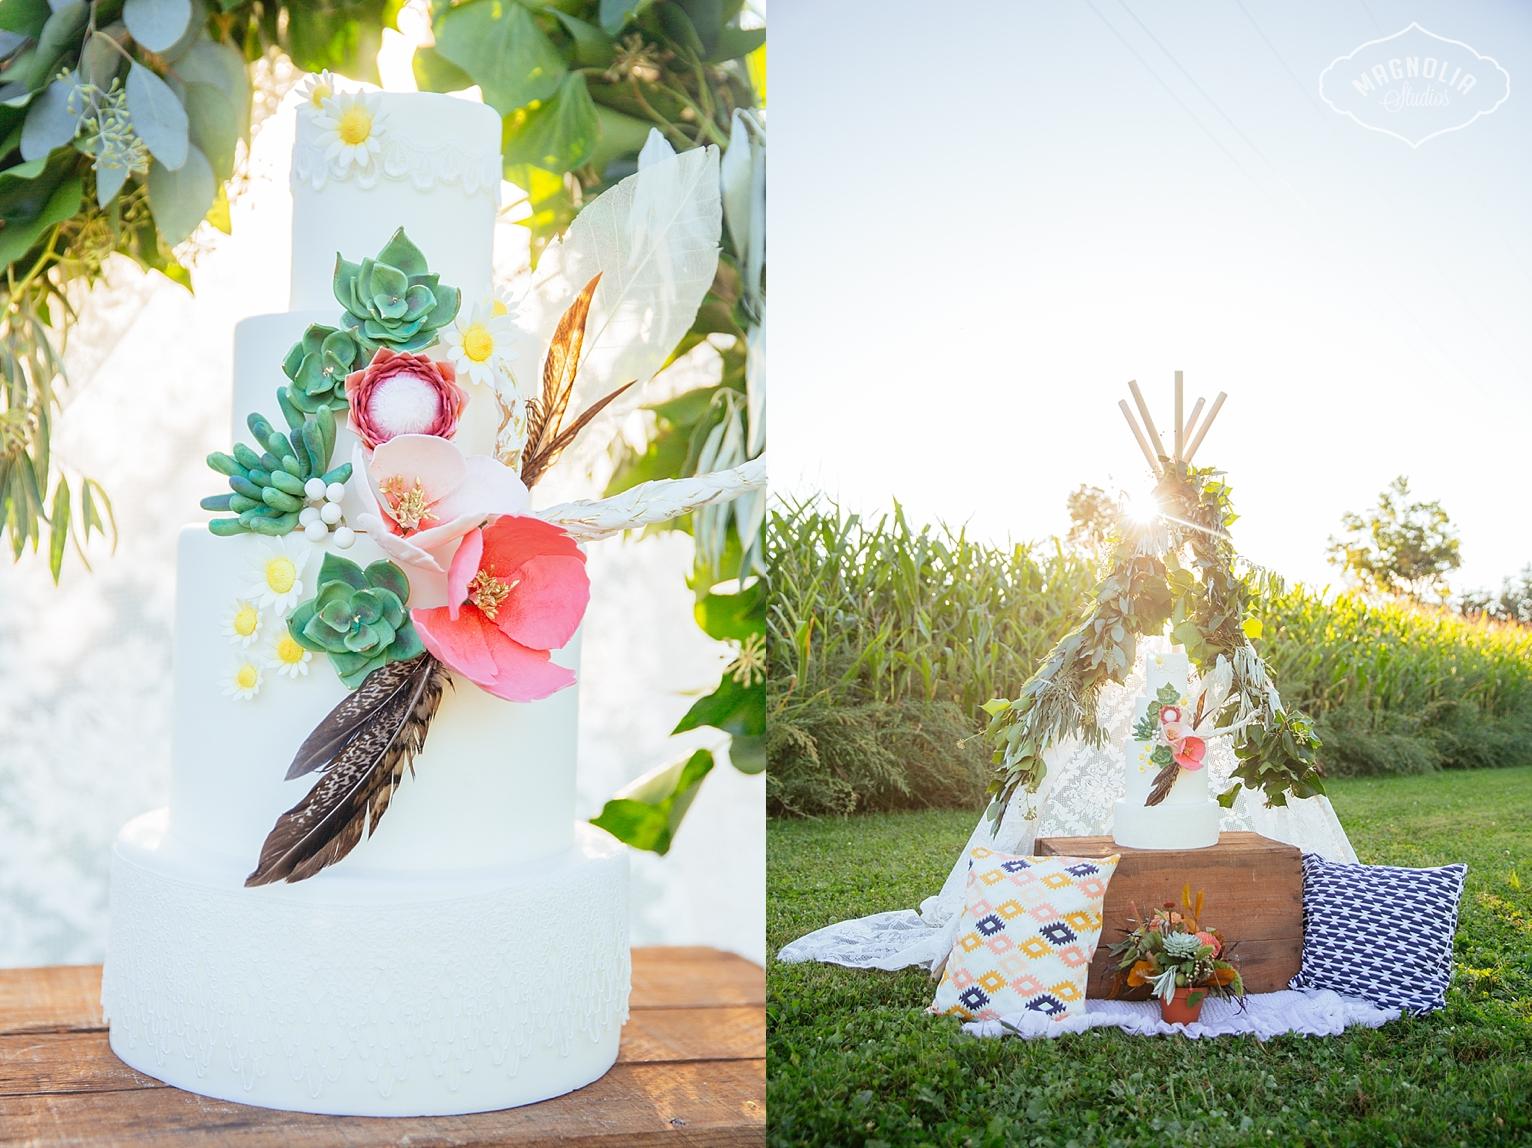 Festival style wedding, bohemian bride, indie bride hipster bride